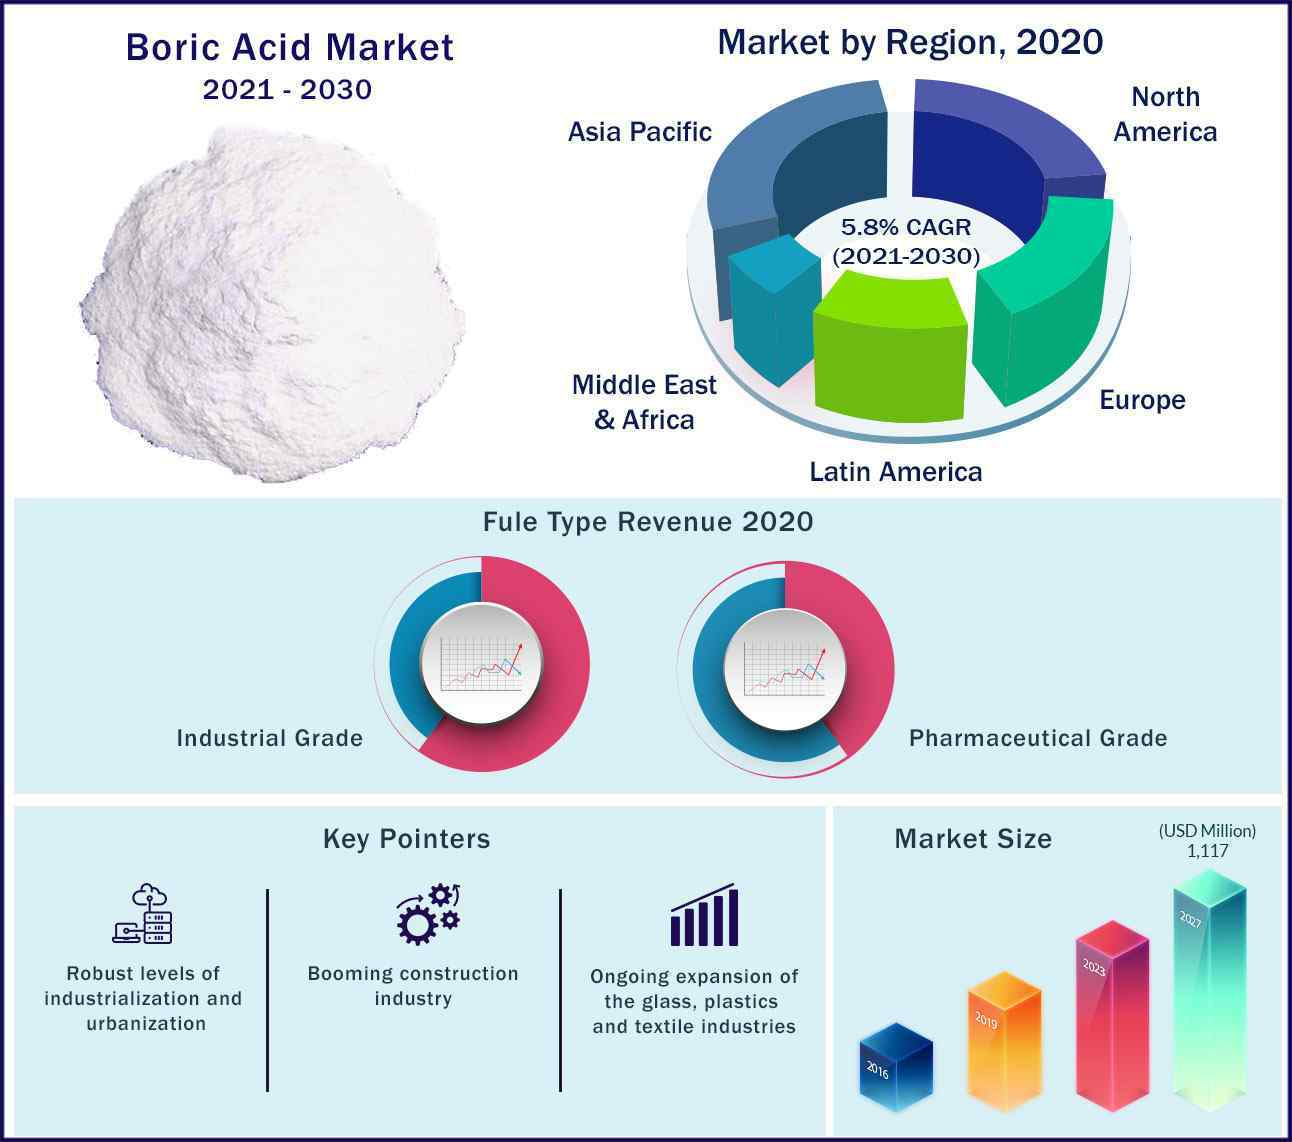 Global Boric Acid Market 2021 2030